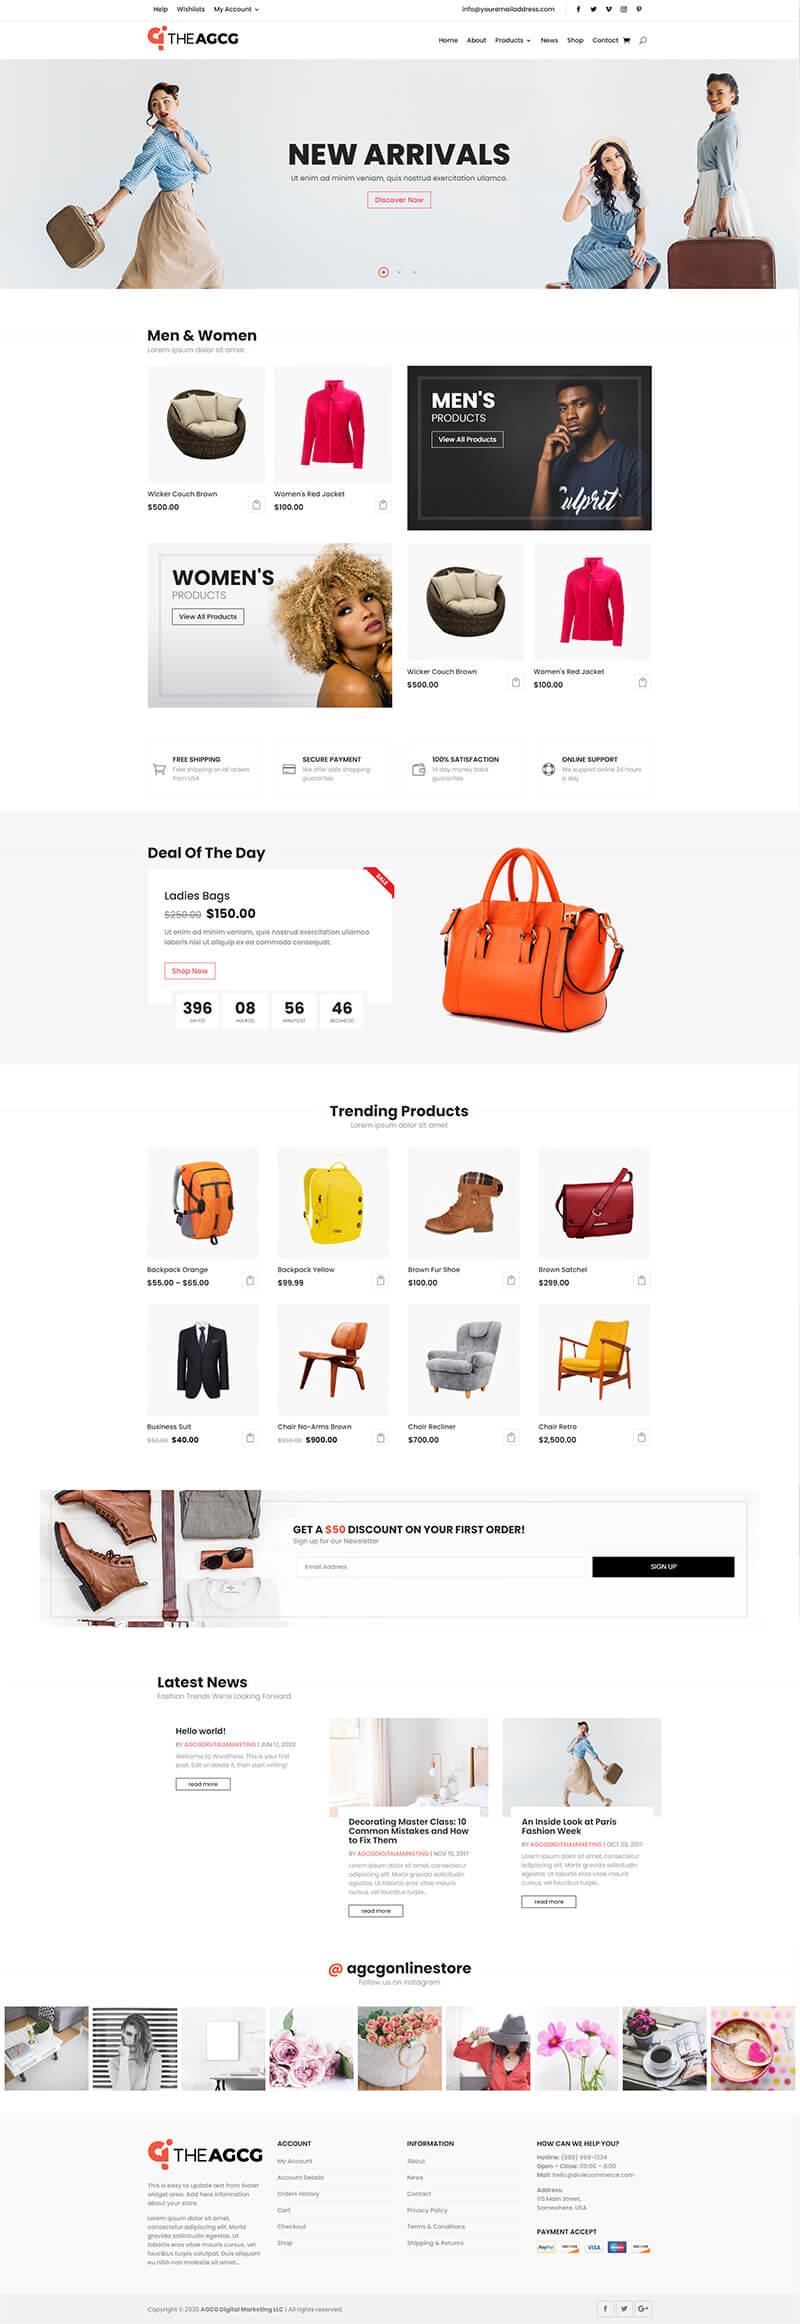 Dshop-0003 Homepage